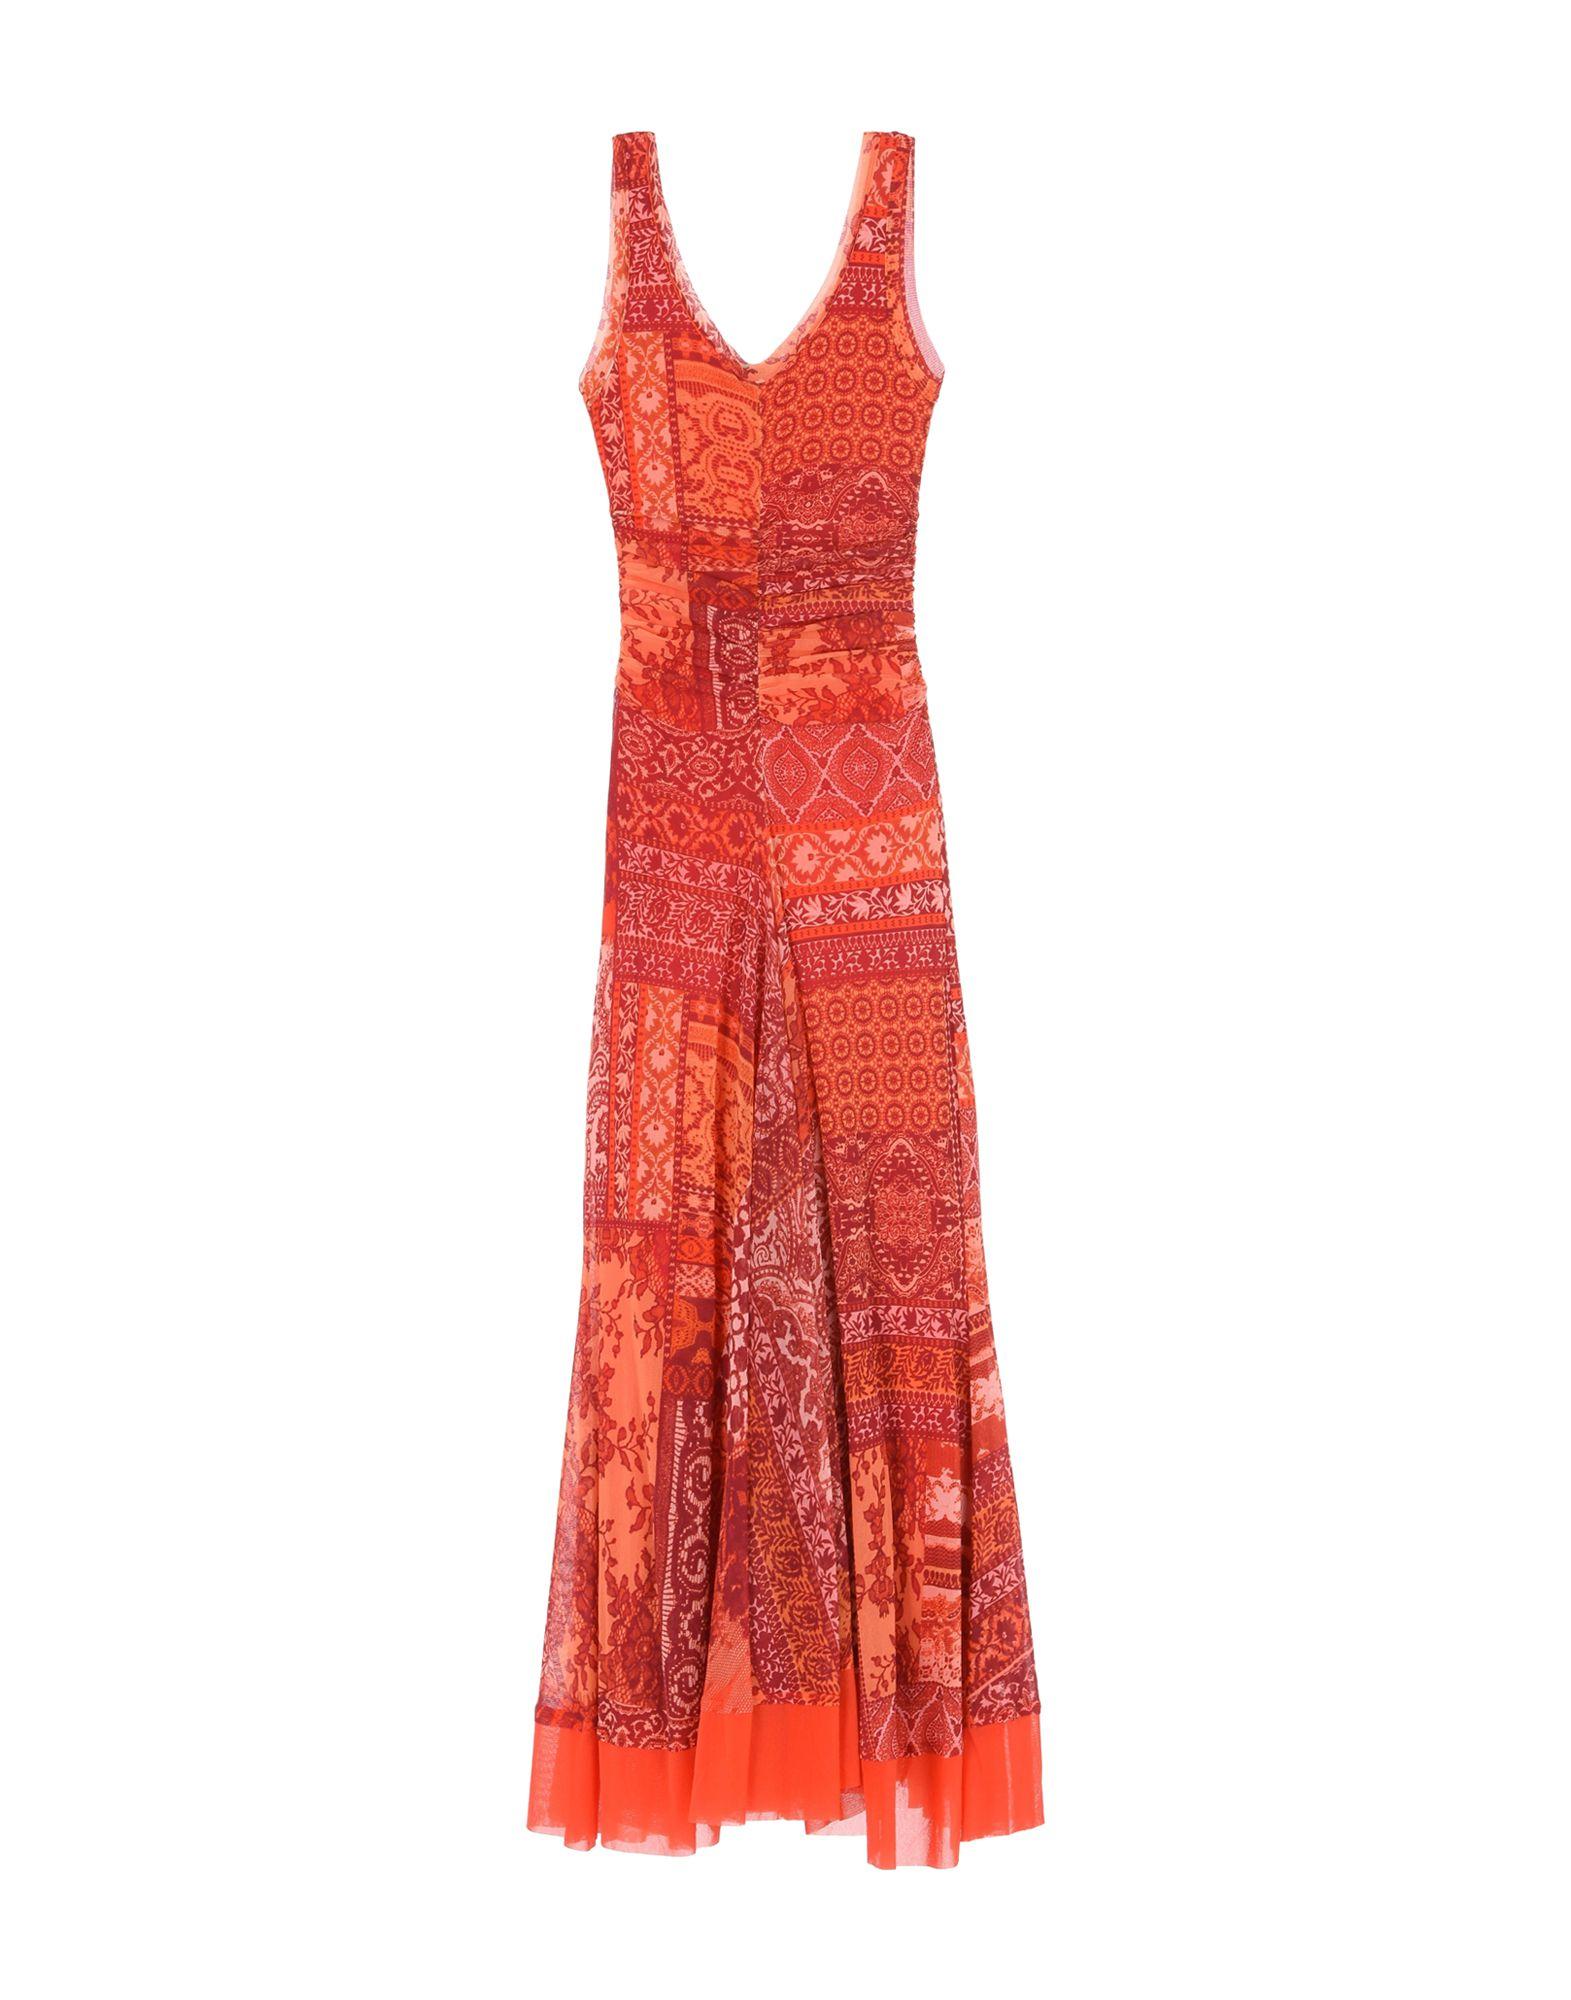 Vestito Lungo Fuzzi Donna - Acquista online su jlKFCTIXe